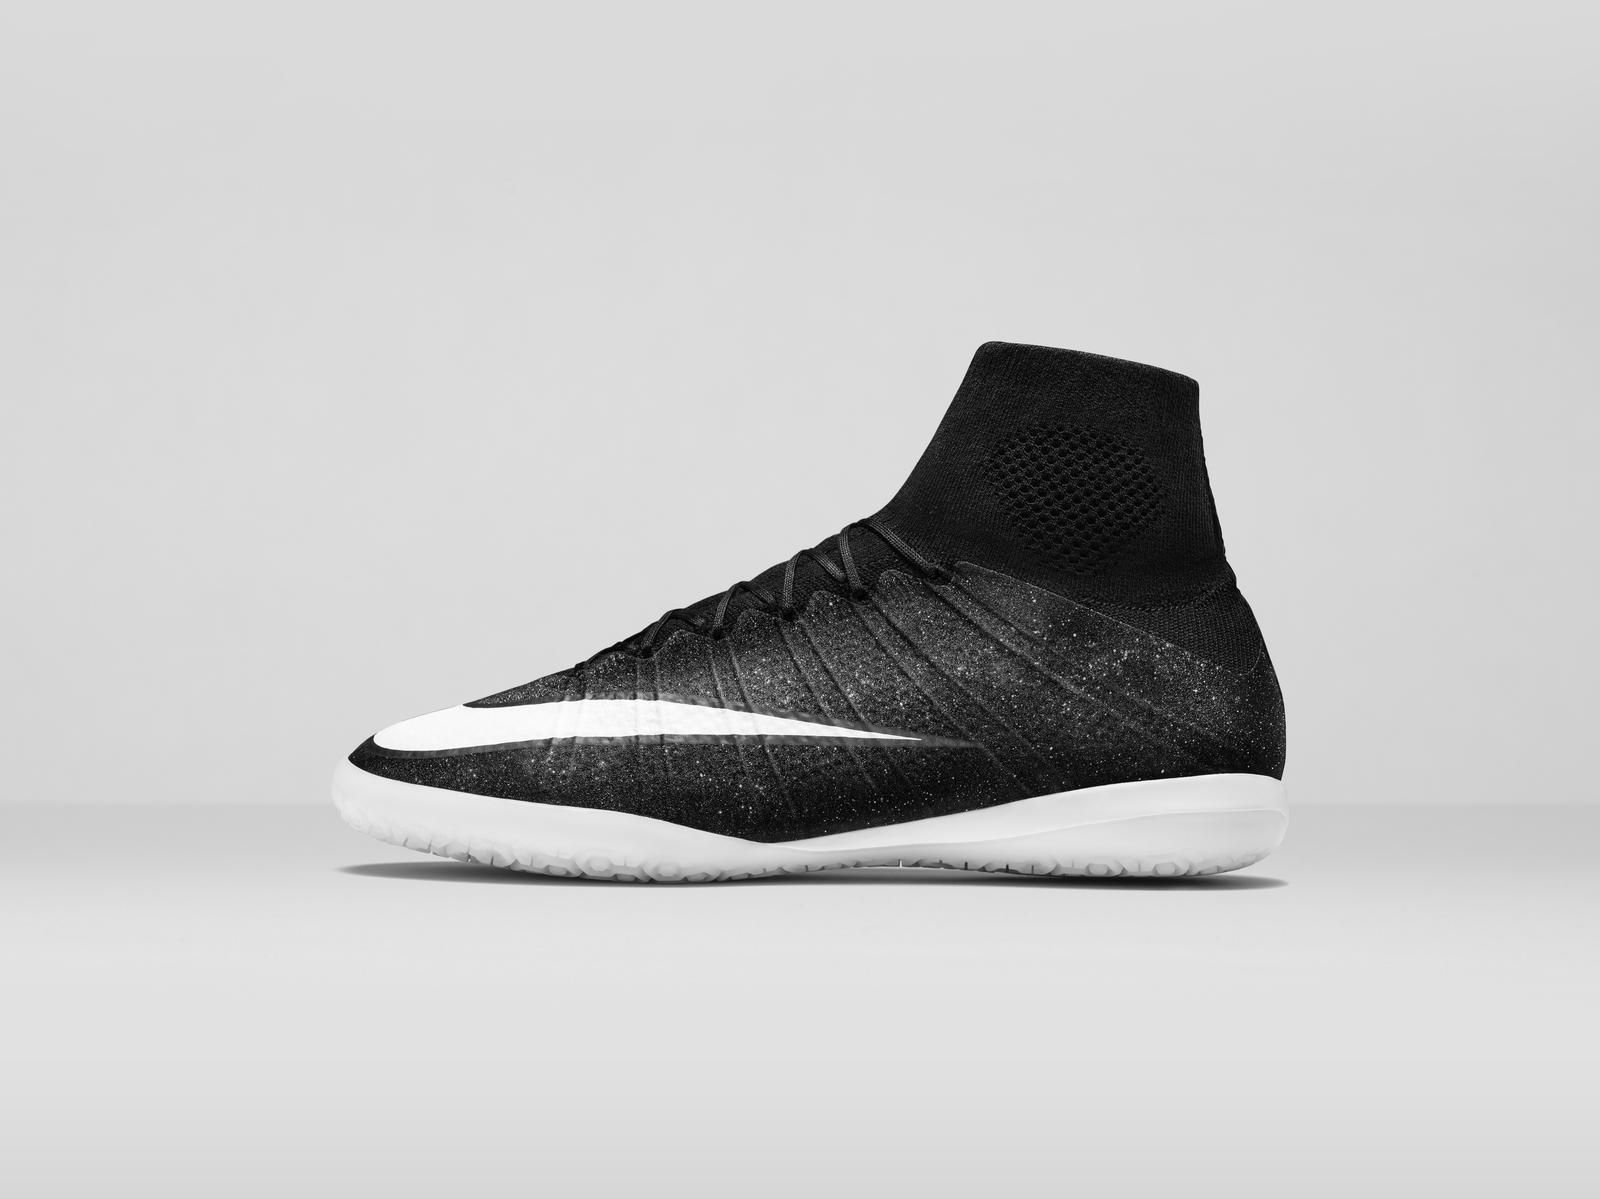 Nike Golf Shoes Run Small